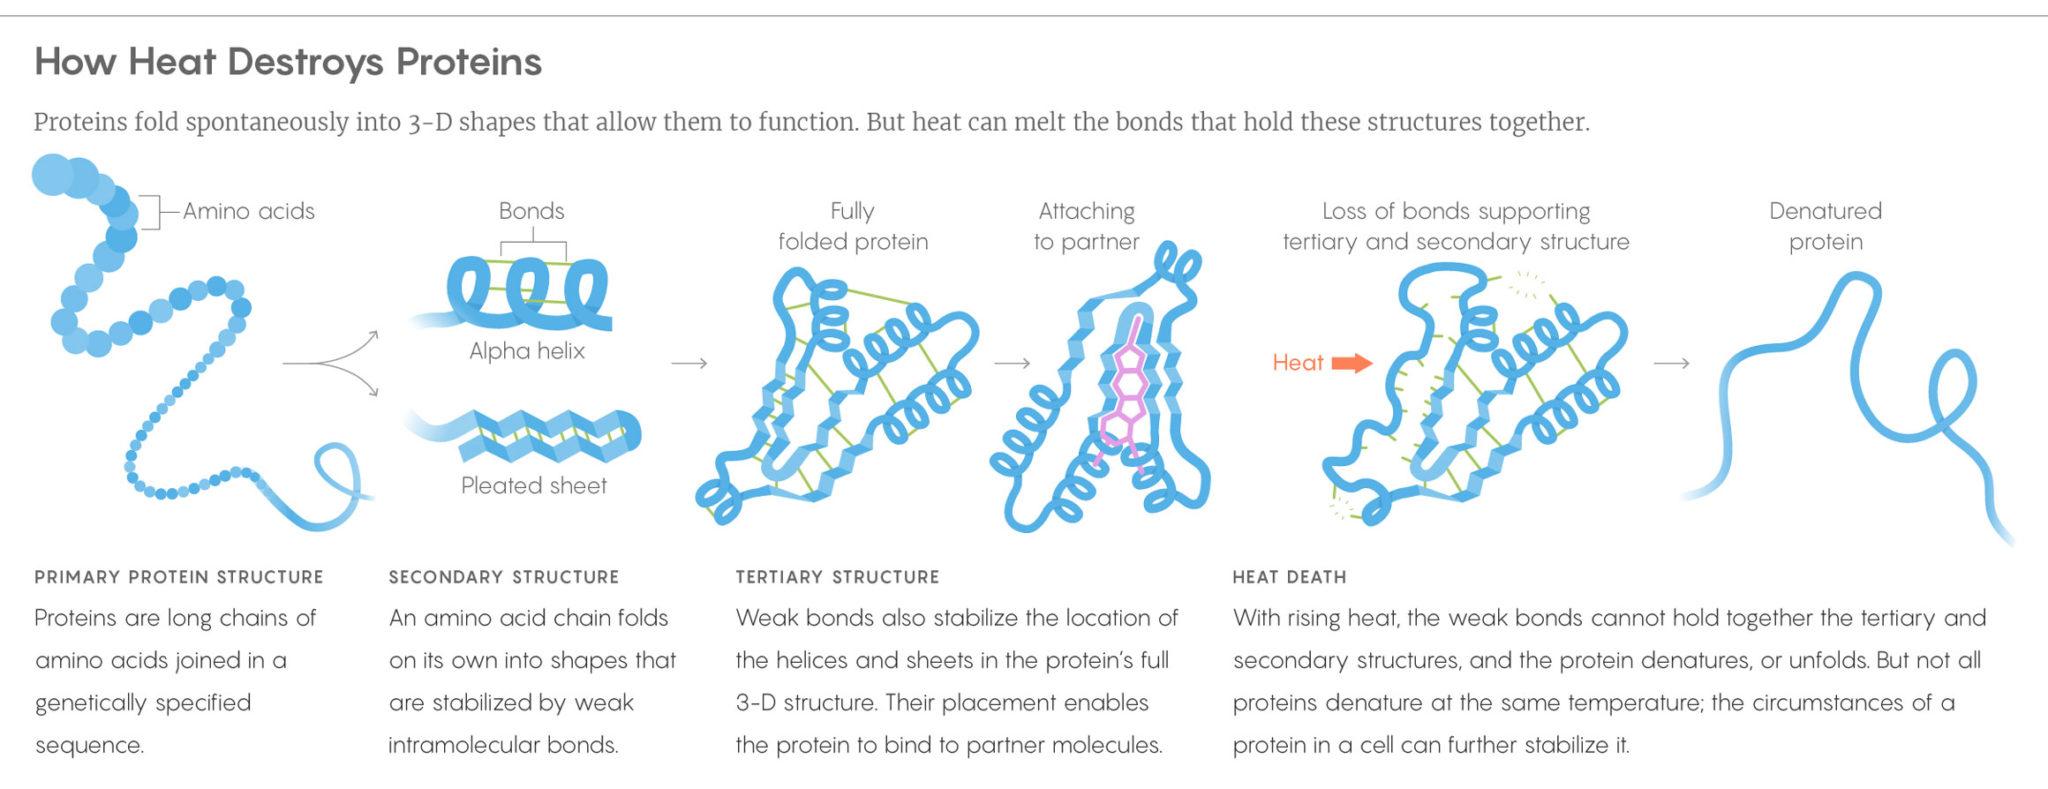 how heat destroys proteins